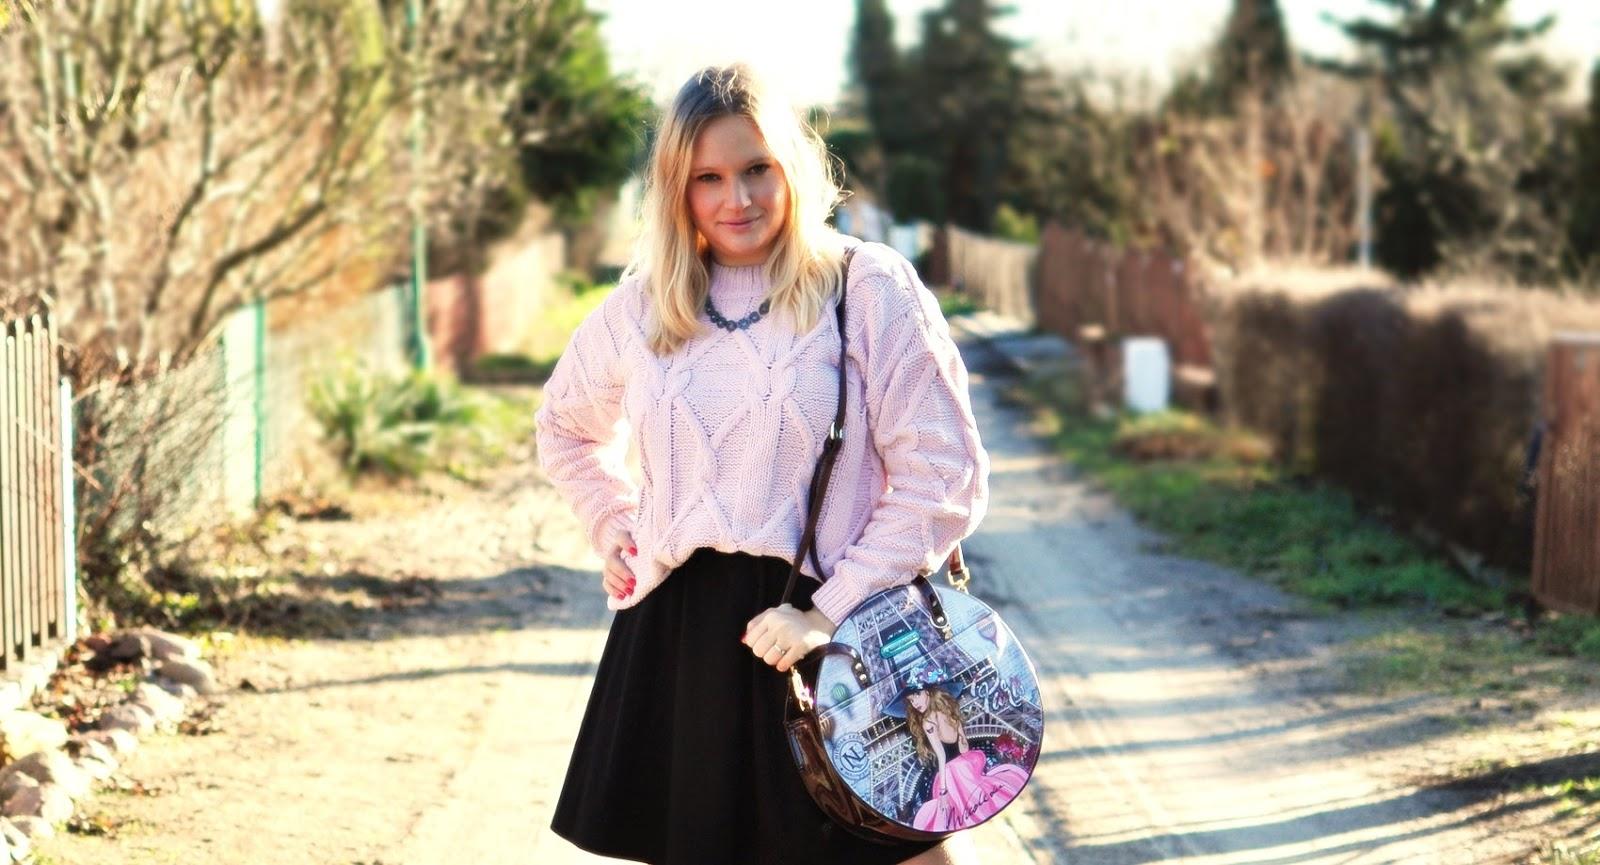 blogerki_Poznan_Kasia-Koniakowska.JPG